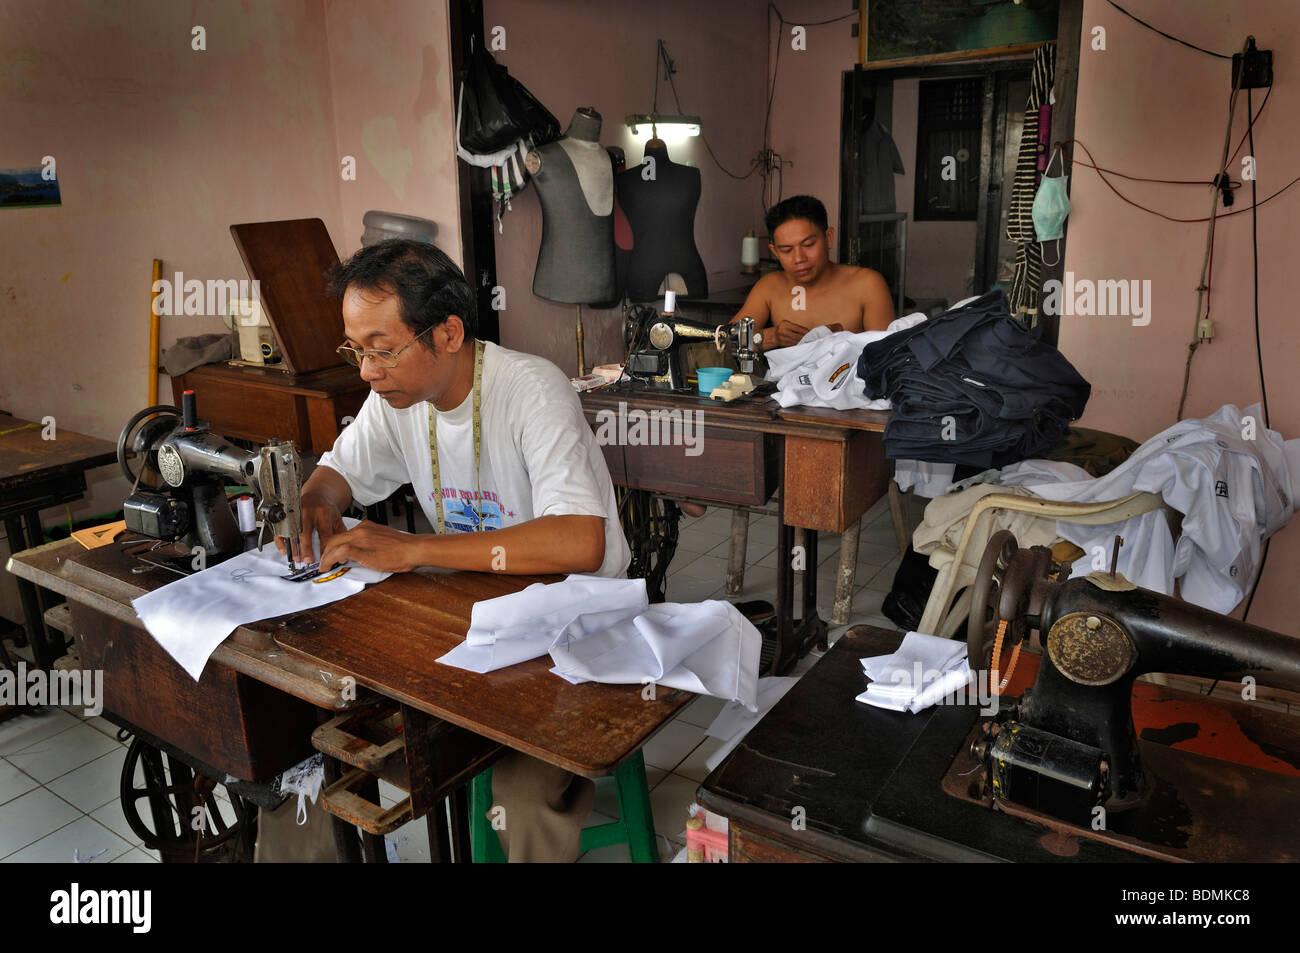 Tailor shop, Sanur, Denpasar, Bali, Indonesia, Southeast Asia - Stock Image